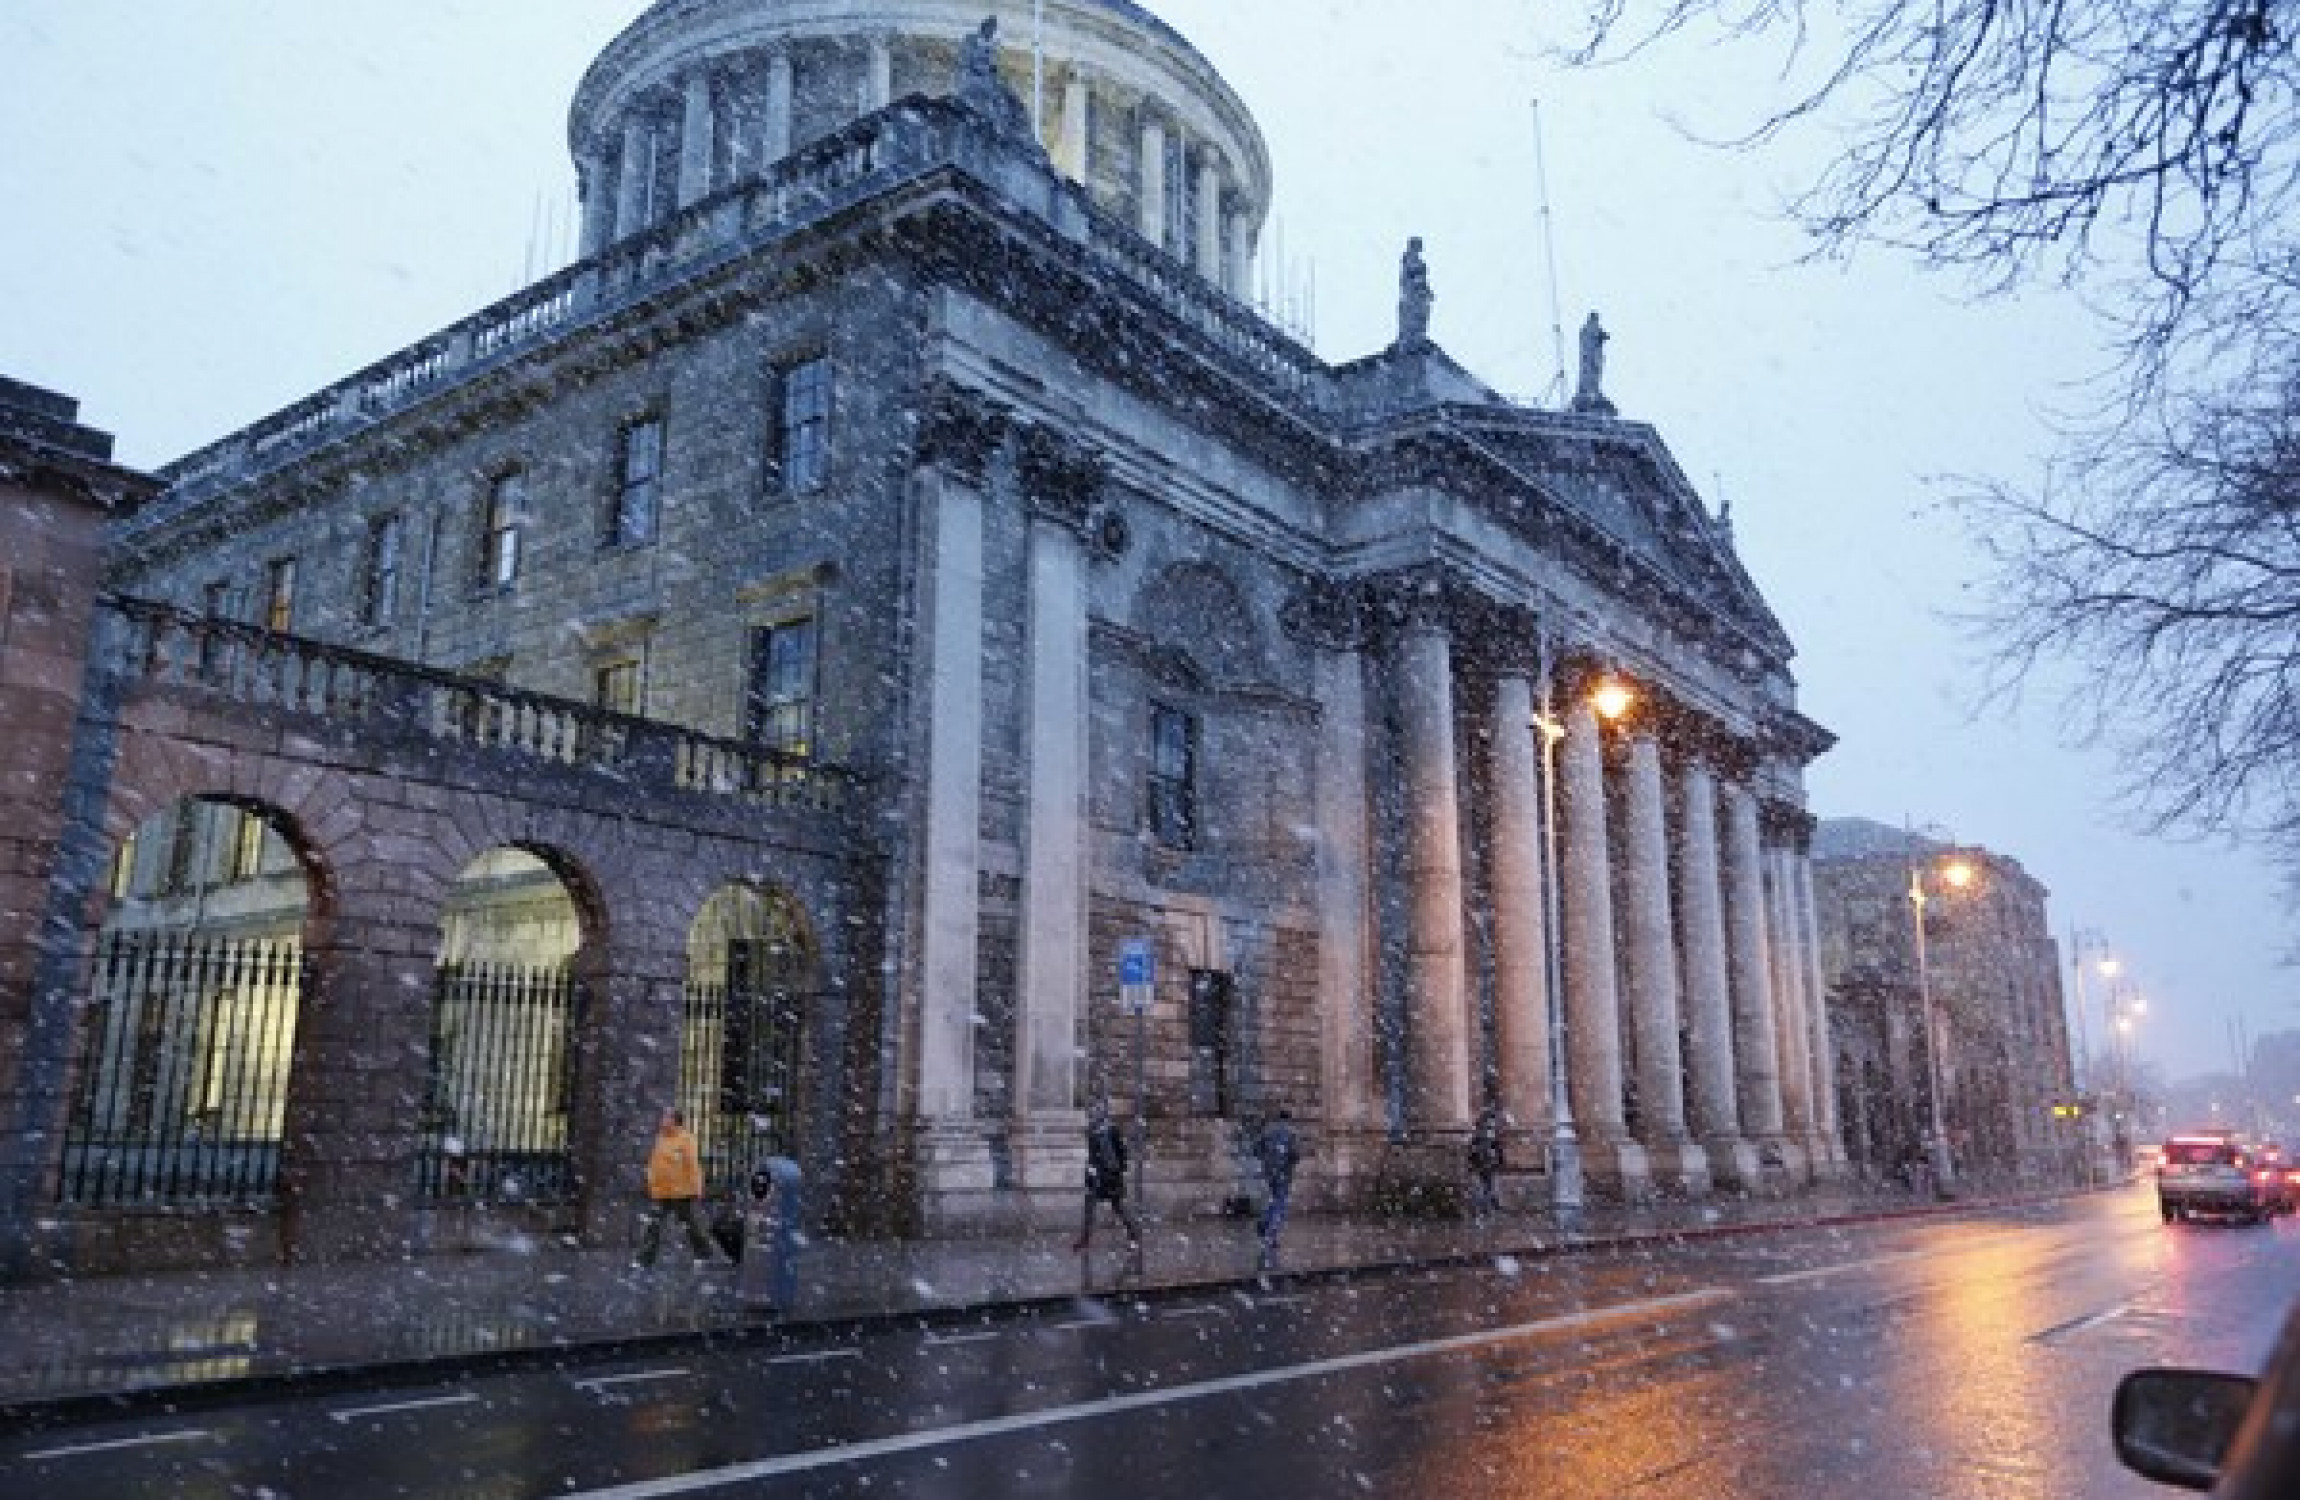 Court confirms asylum seeker work ban is unconstitutional